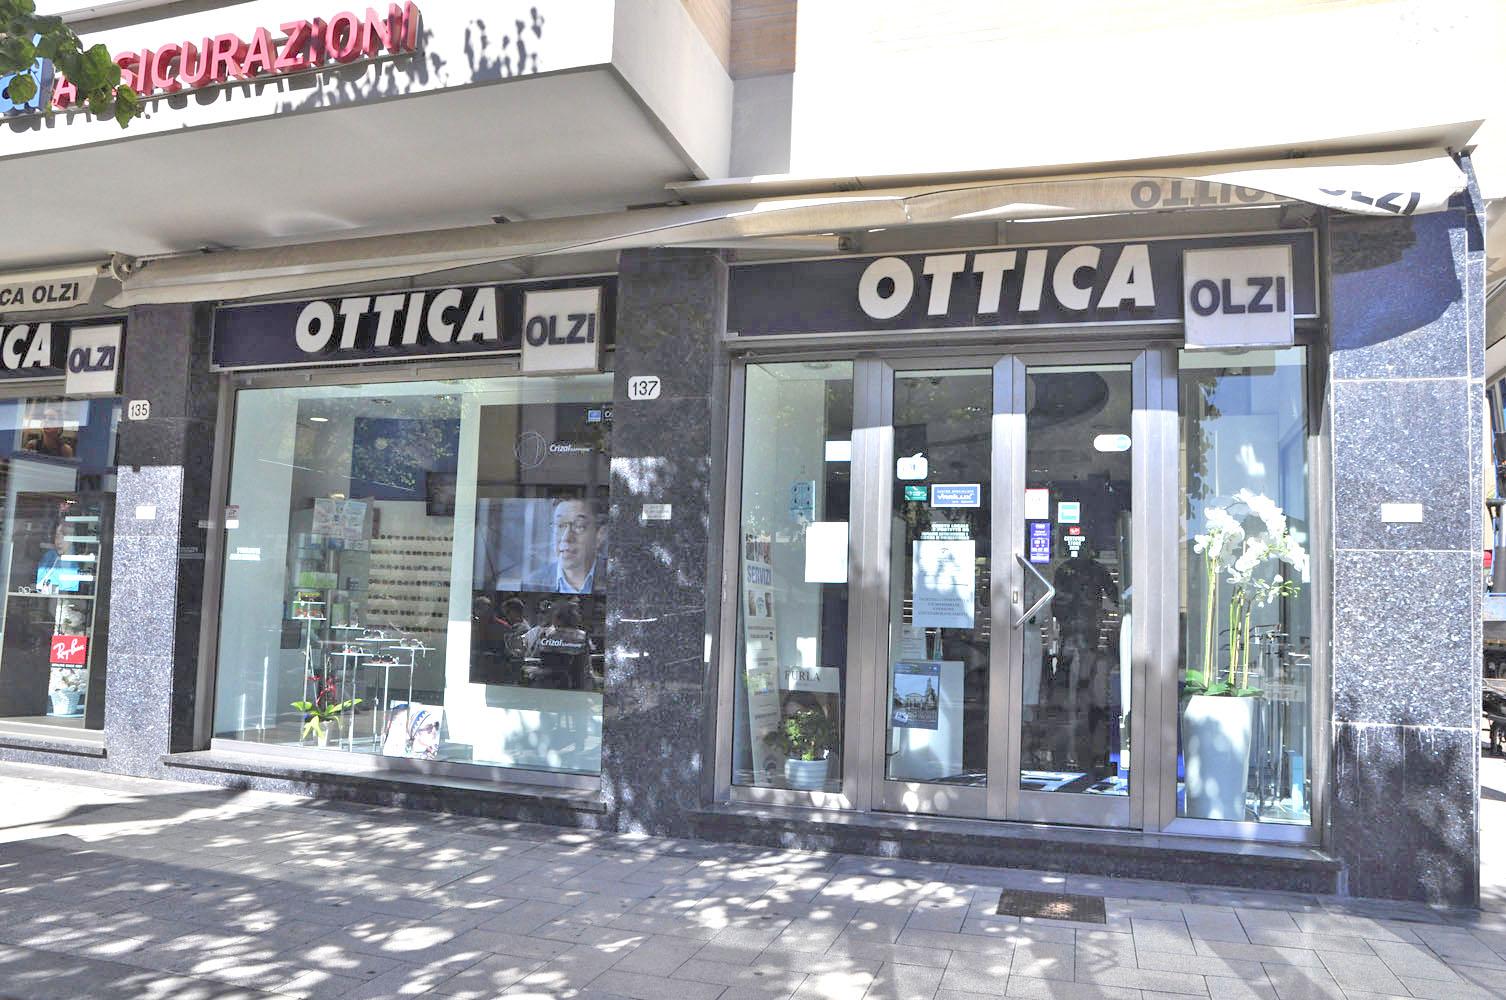 Ottica Olzi